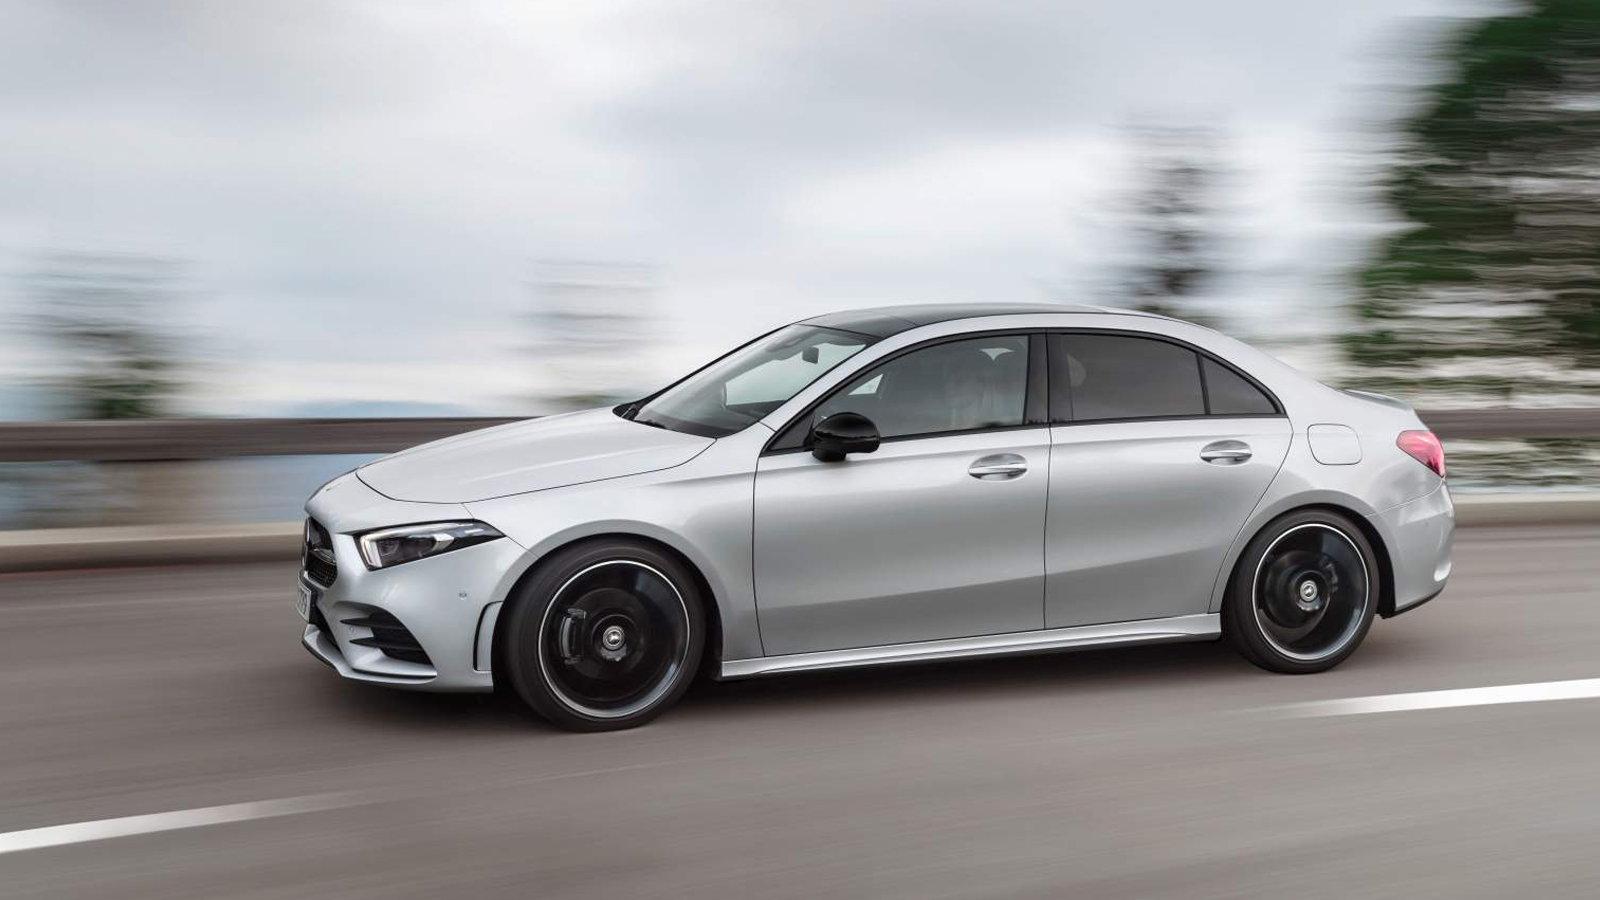 New A-Class Sedan is World's Most Aerodynamic Car